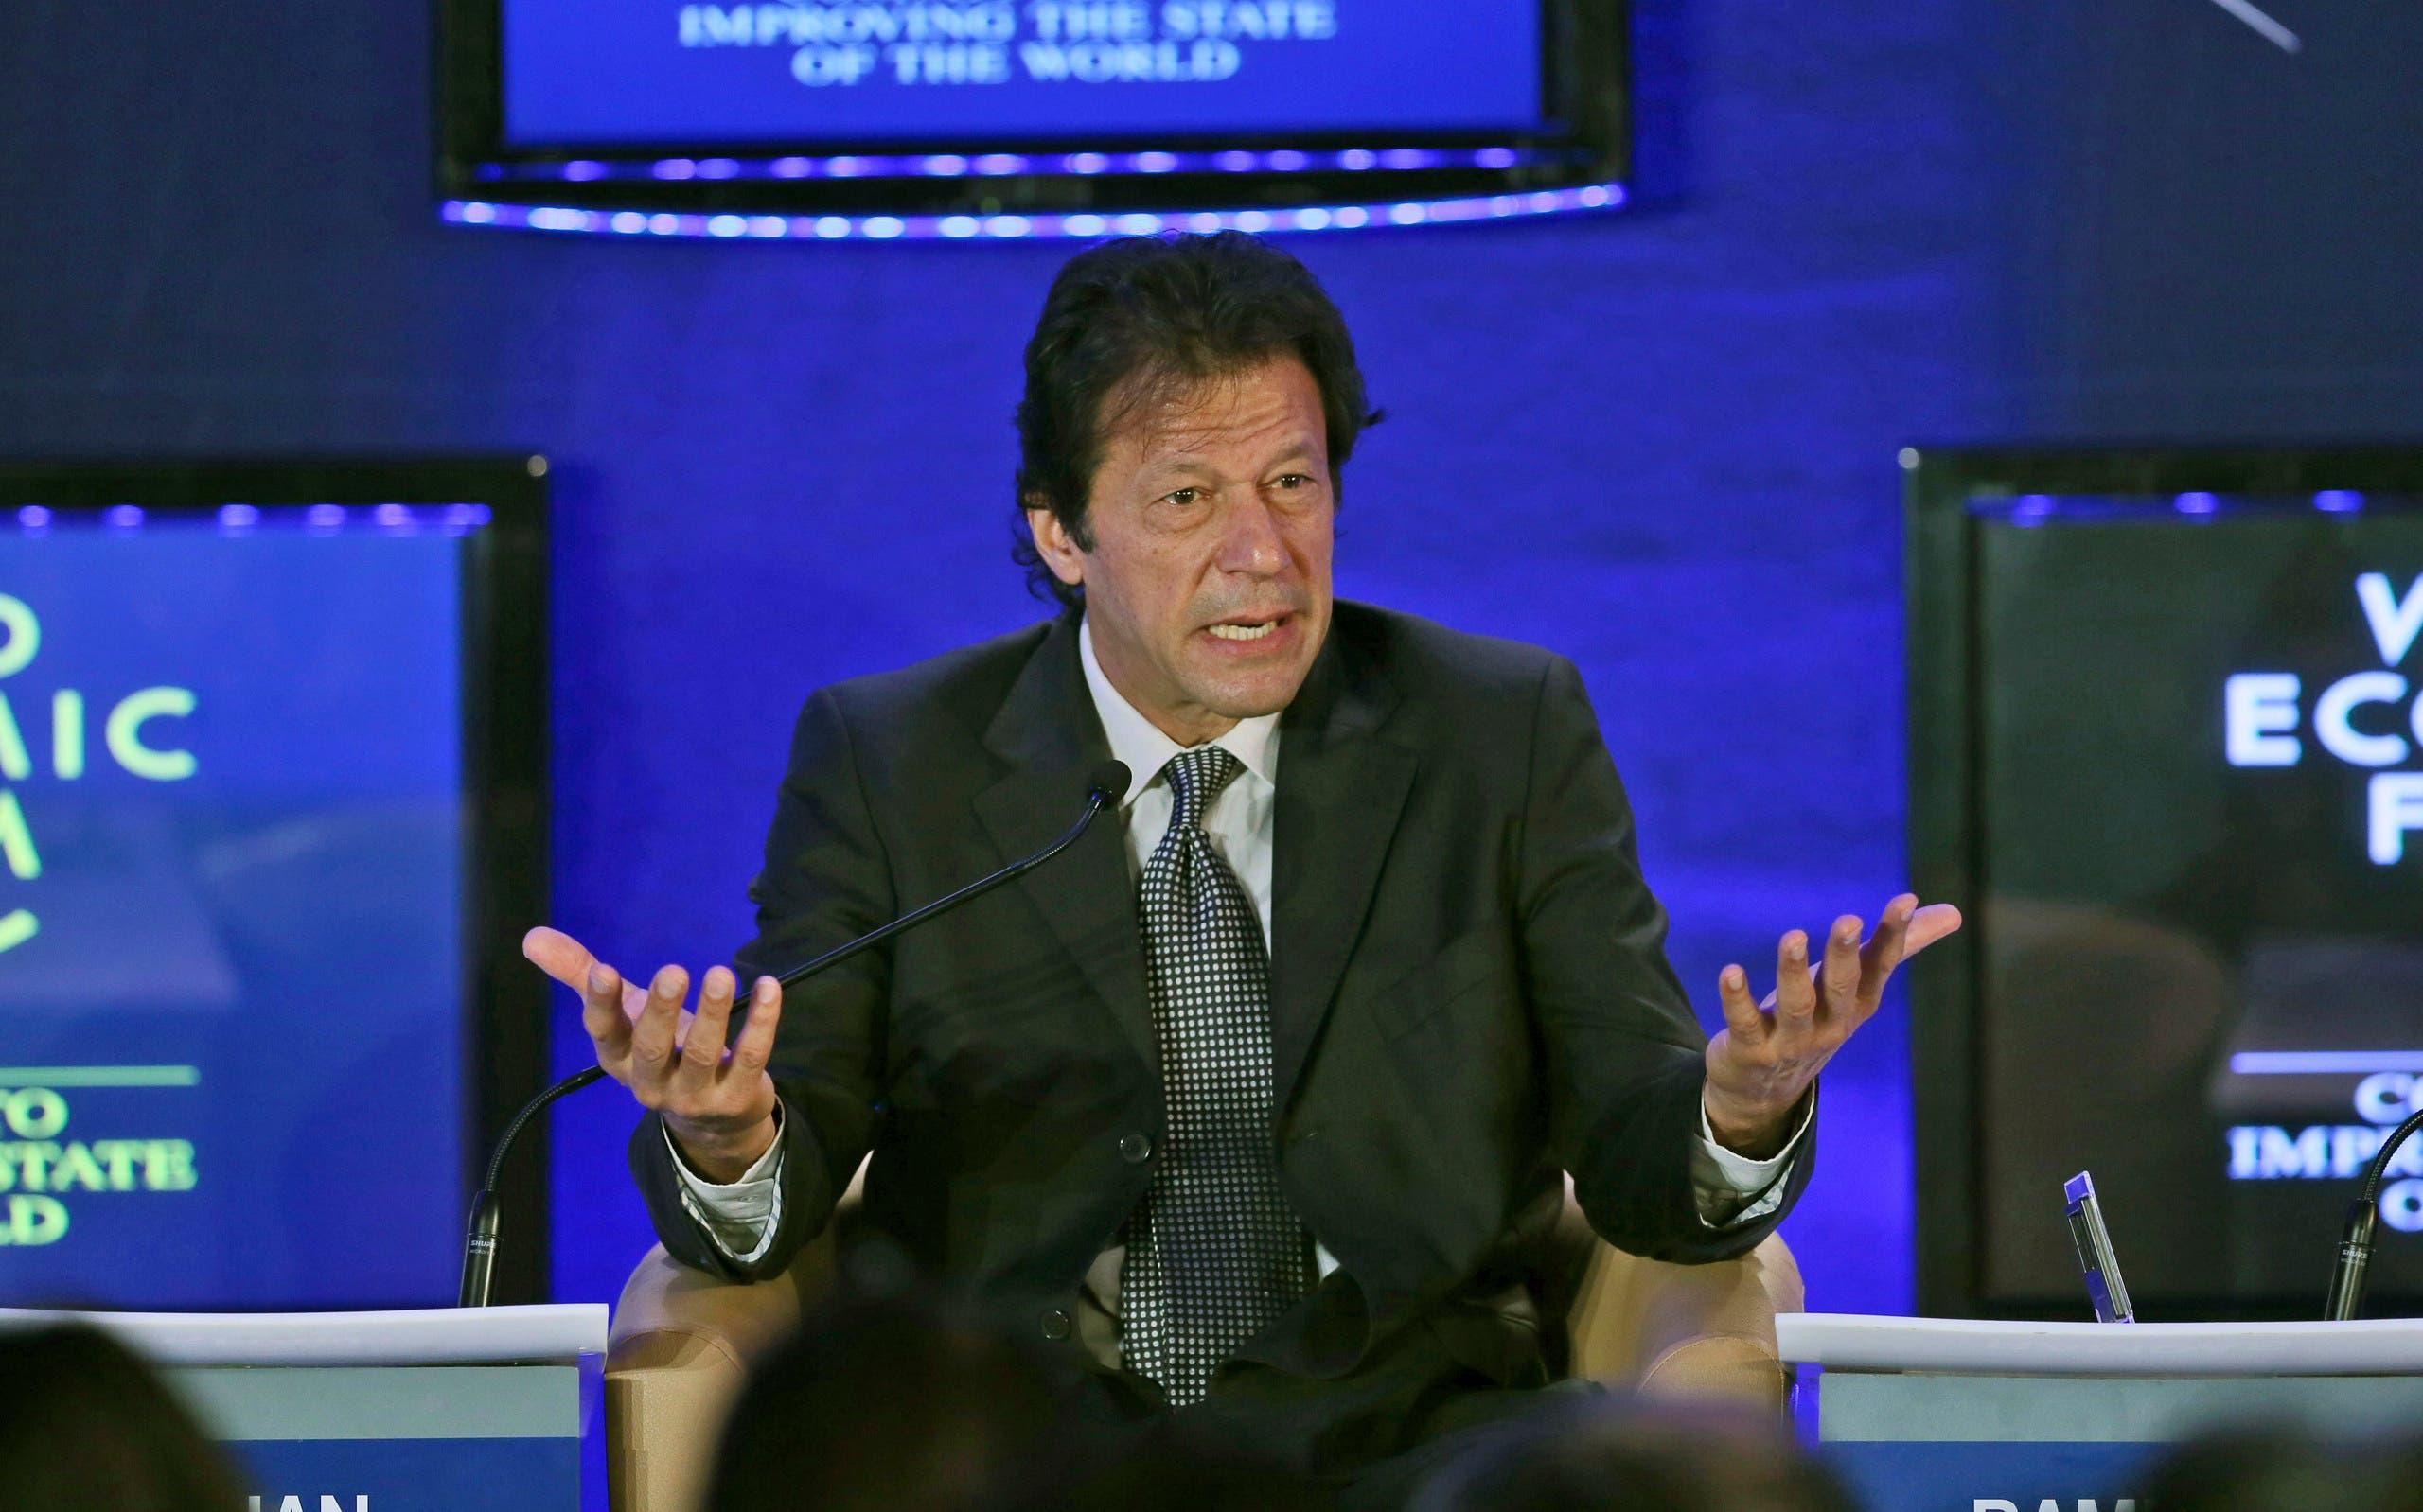 Pakistan Tehreek-e-Insaf Chairman Imran Khan speaks at the World Economic Forum on the outskirts of New Delhi on Jan. 24, 2013. (AP)